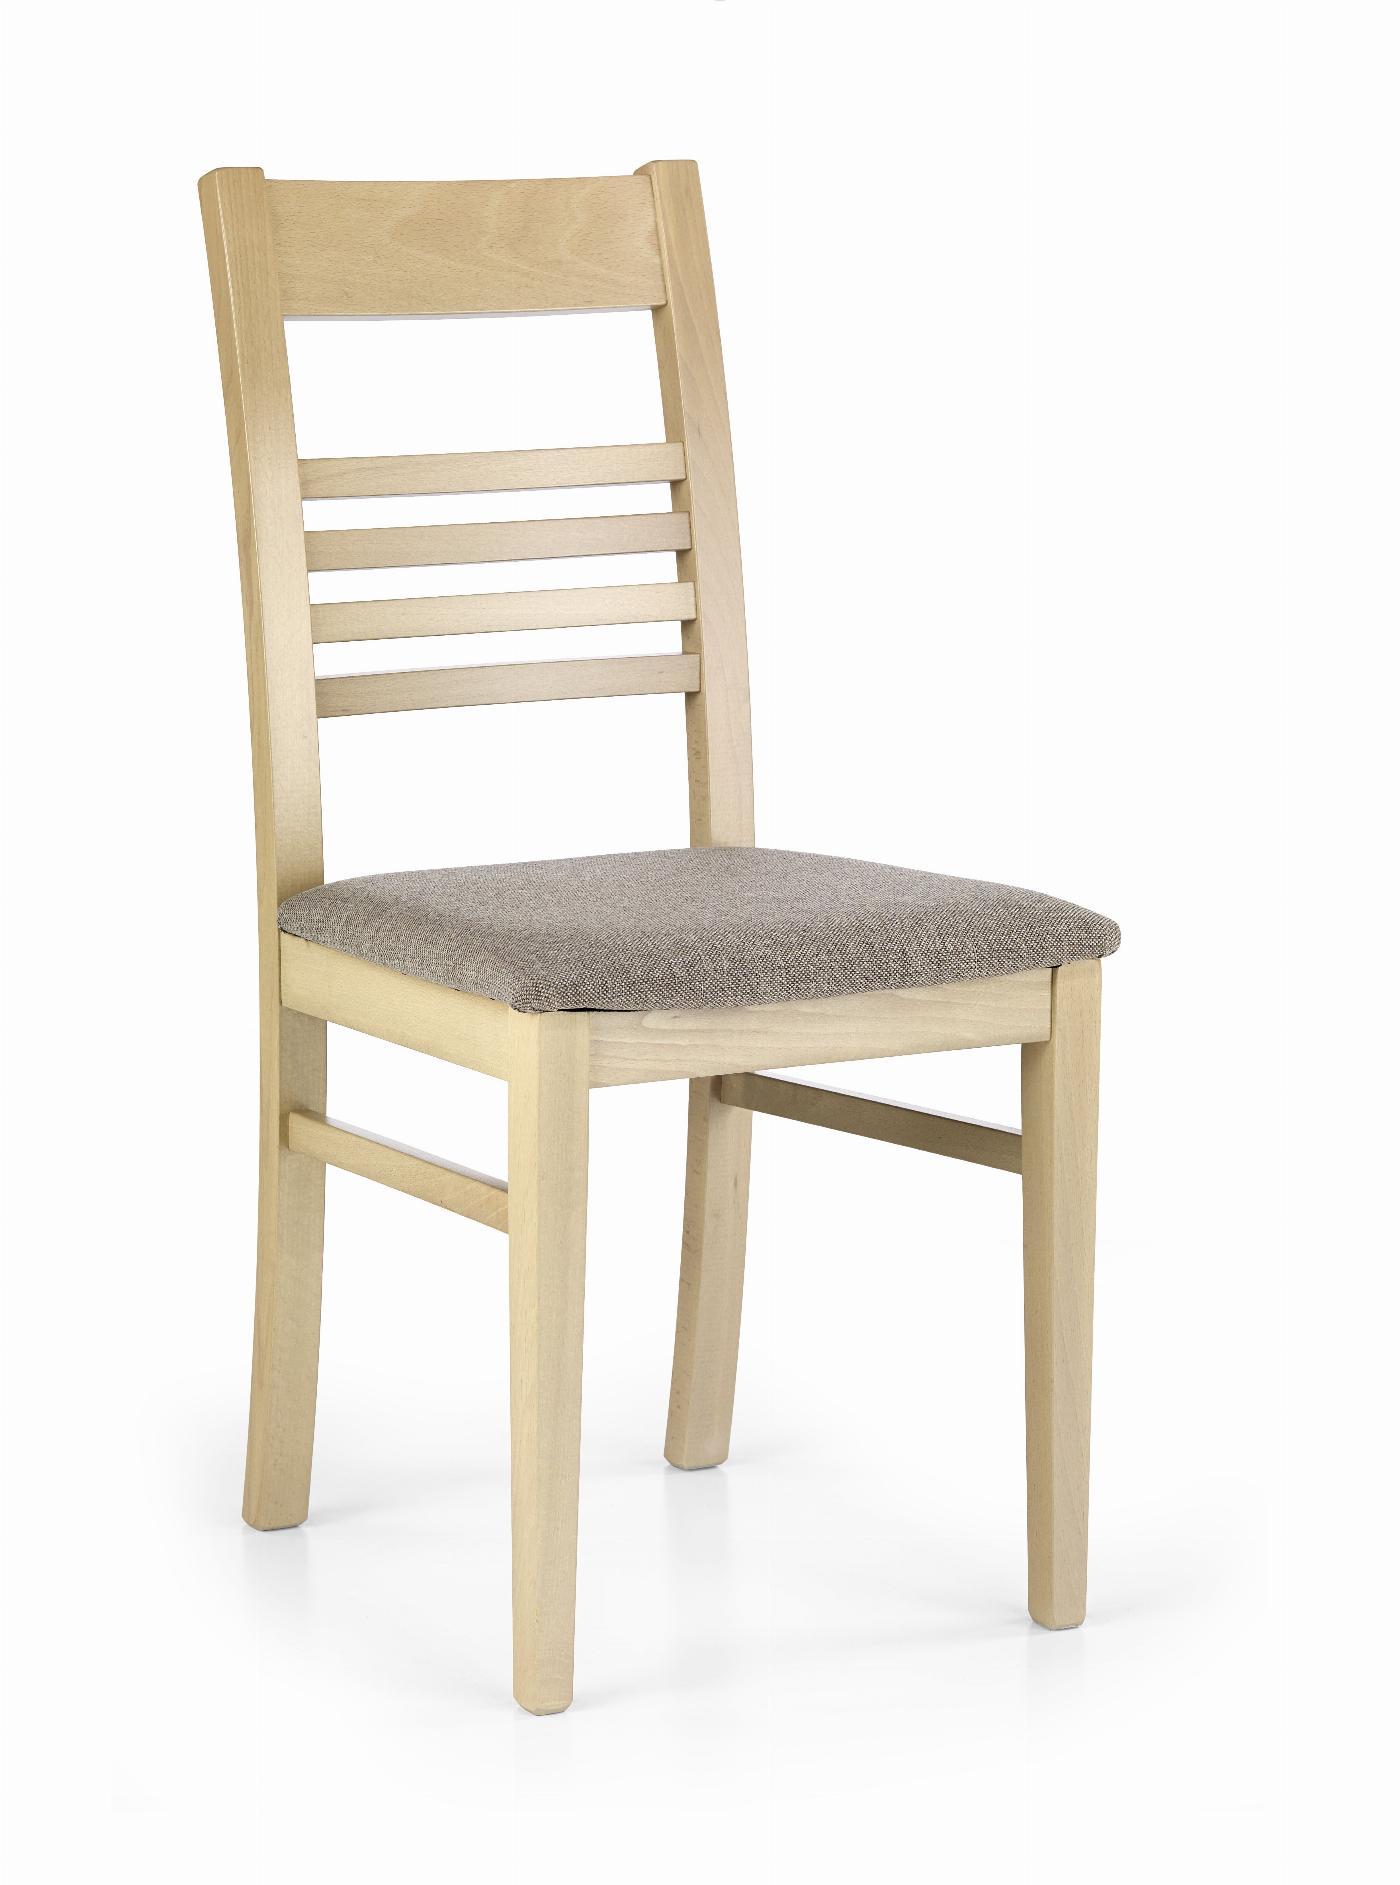 JULIUSZ krzesło dąb sonoma / tap: Inari23 (1p=2szt)